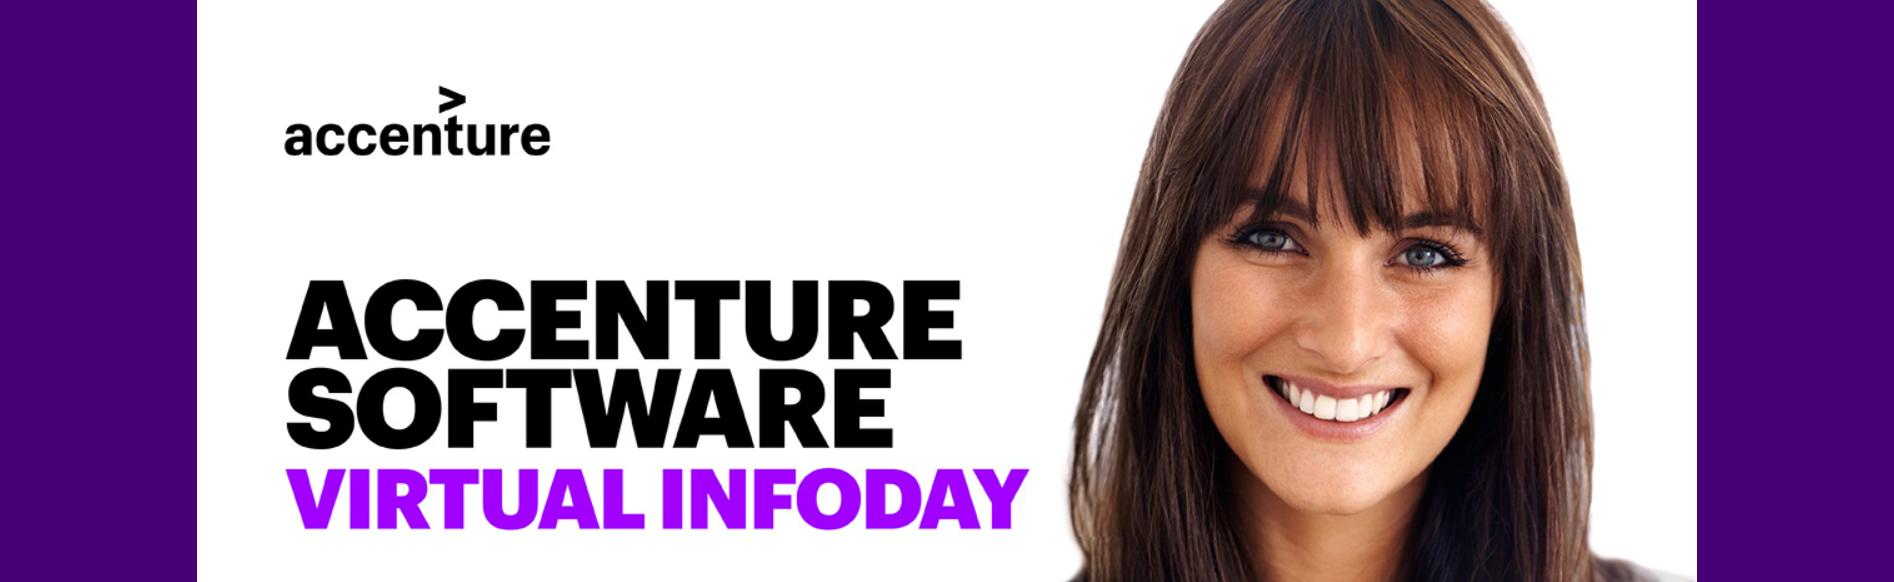 Accenture Virtual Infoday